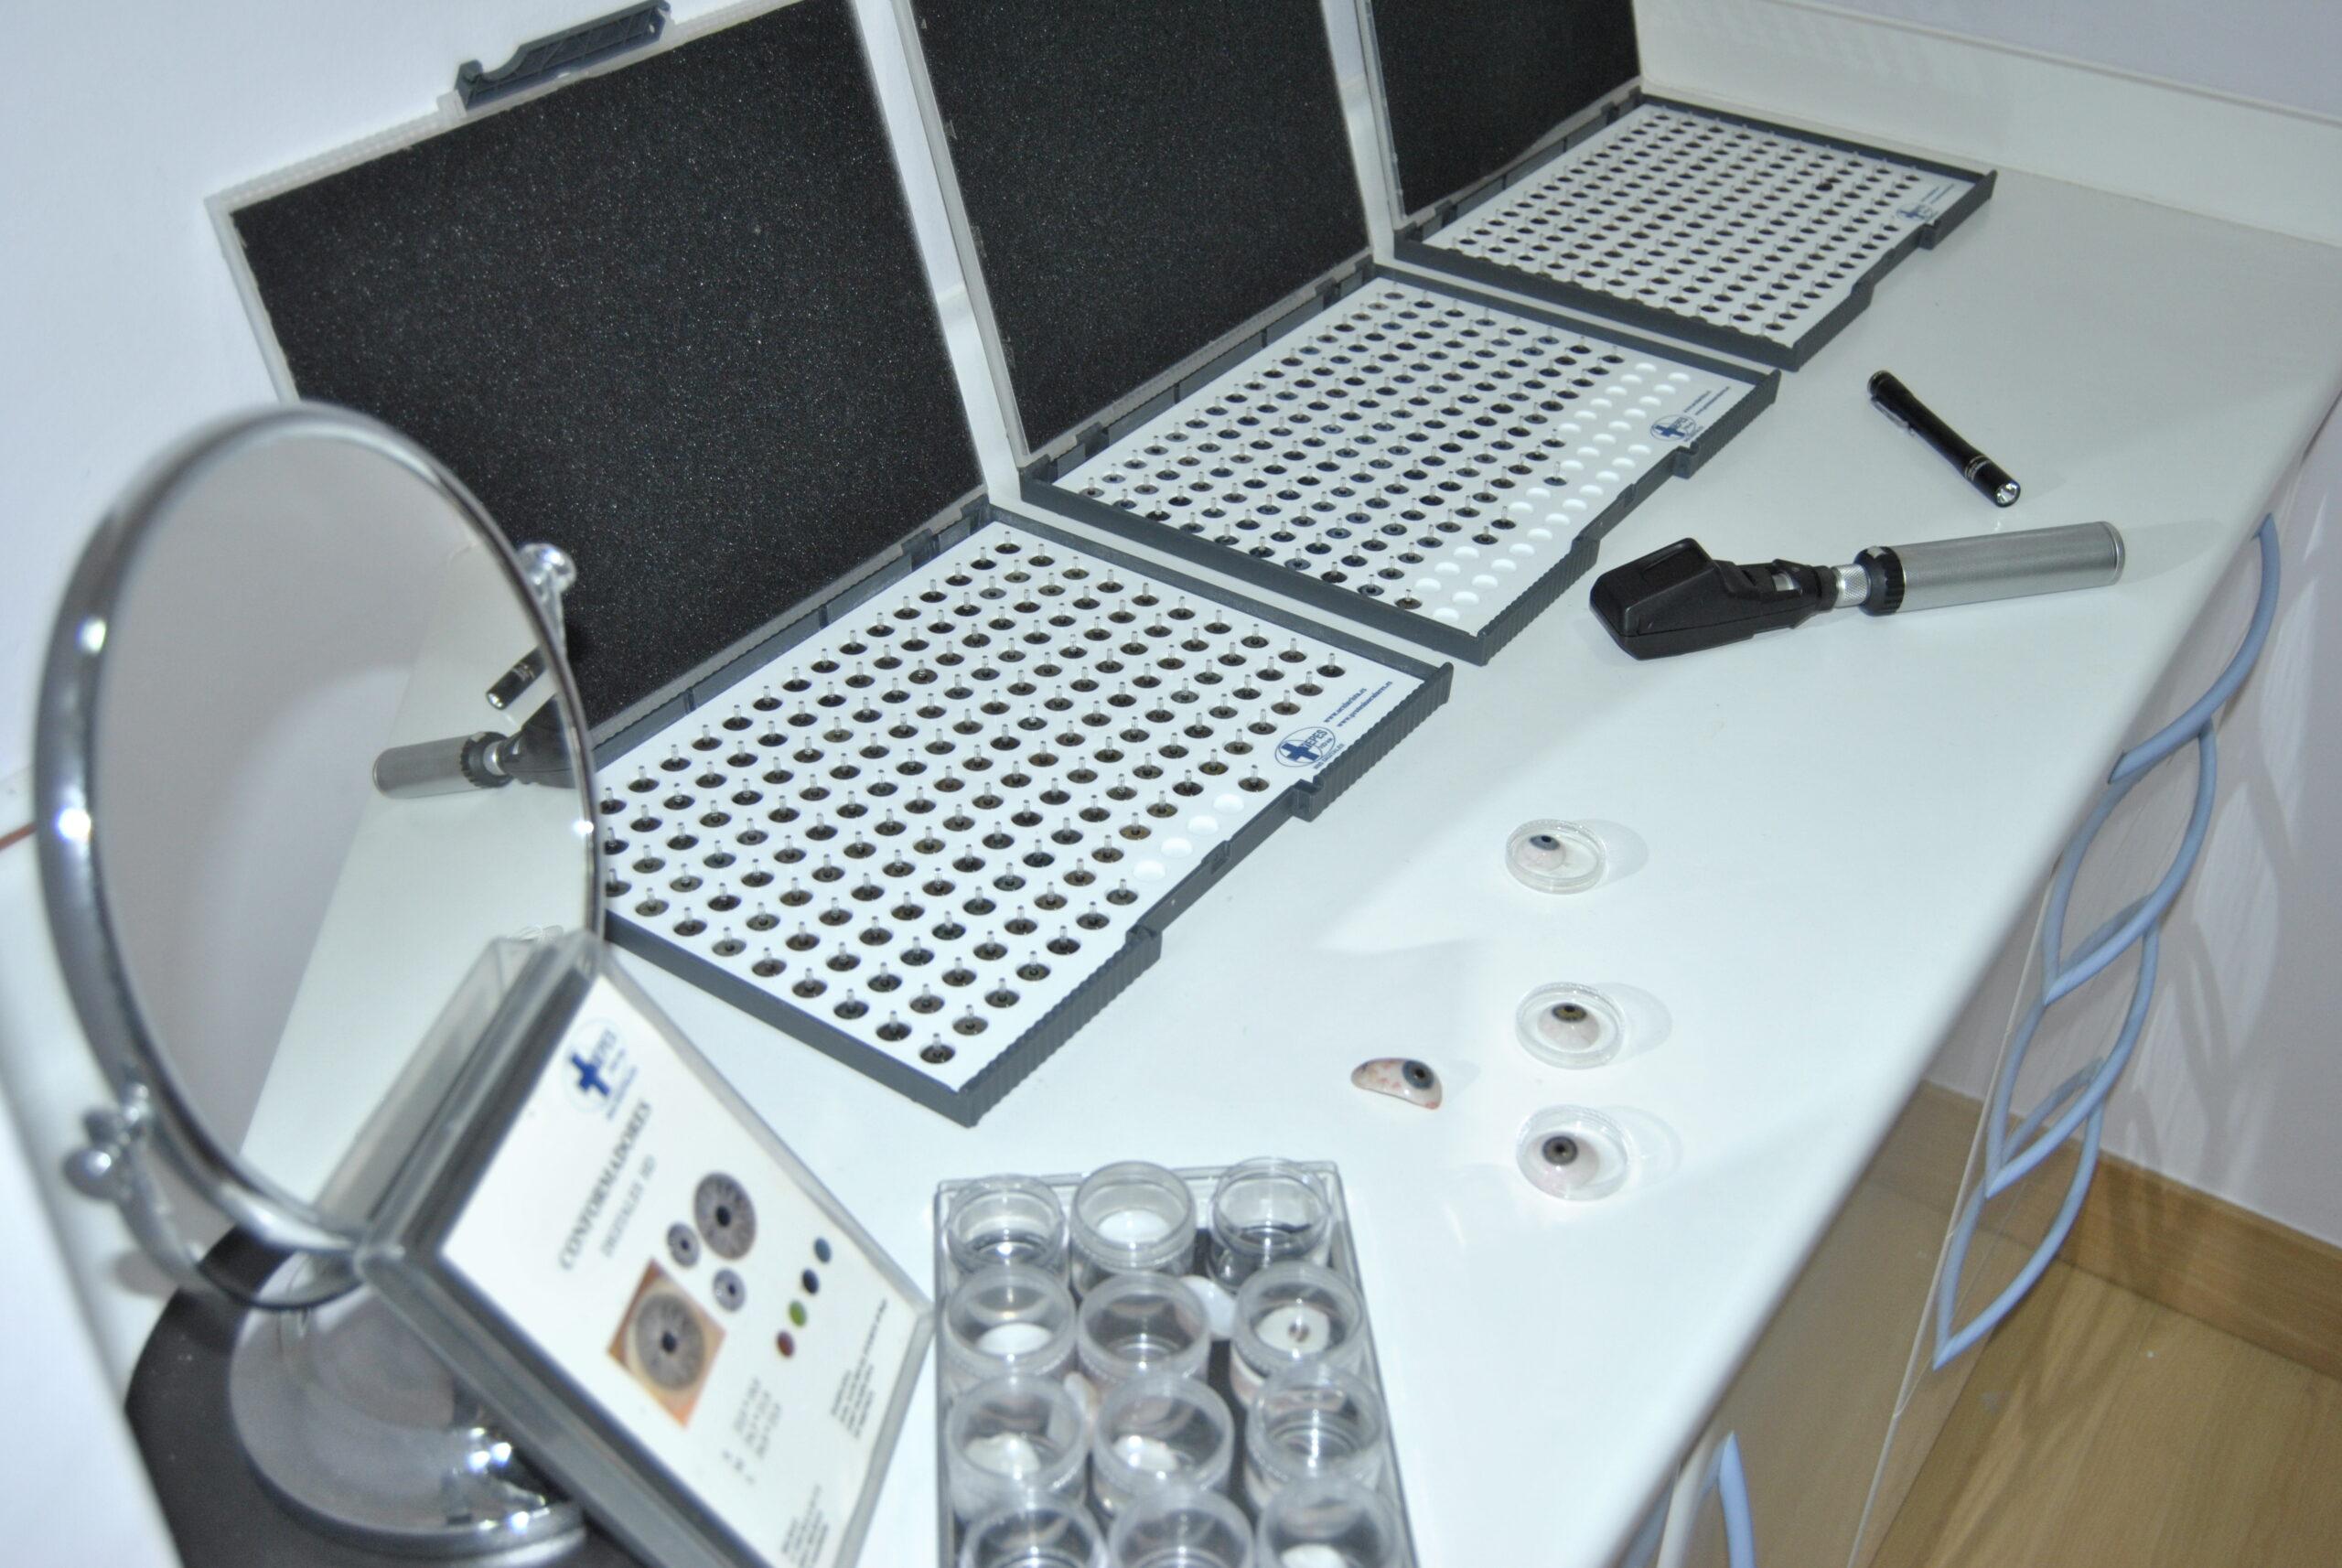 muestras de prótesis oculares